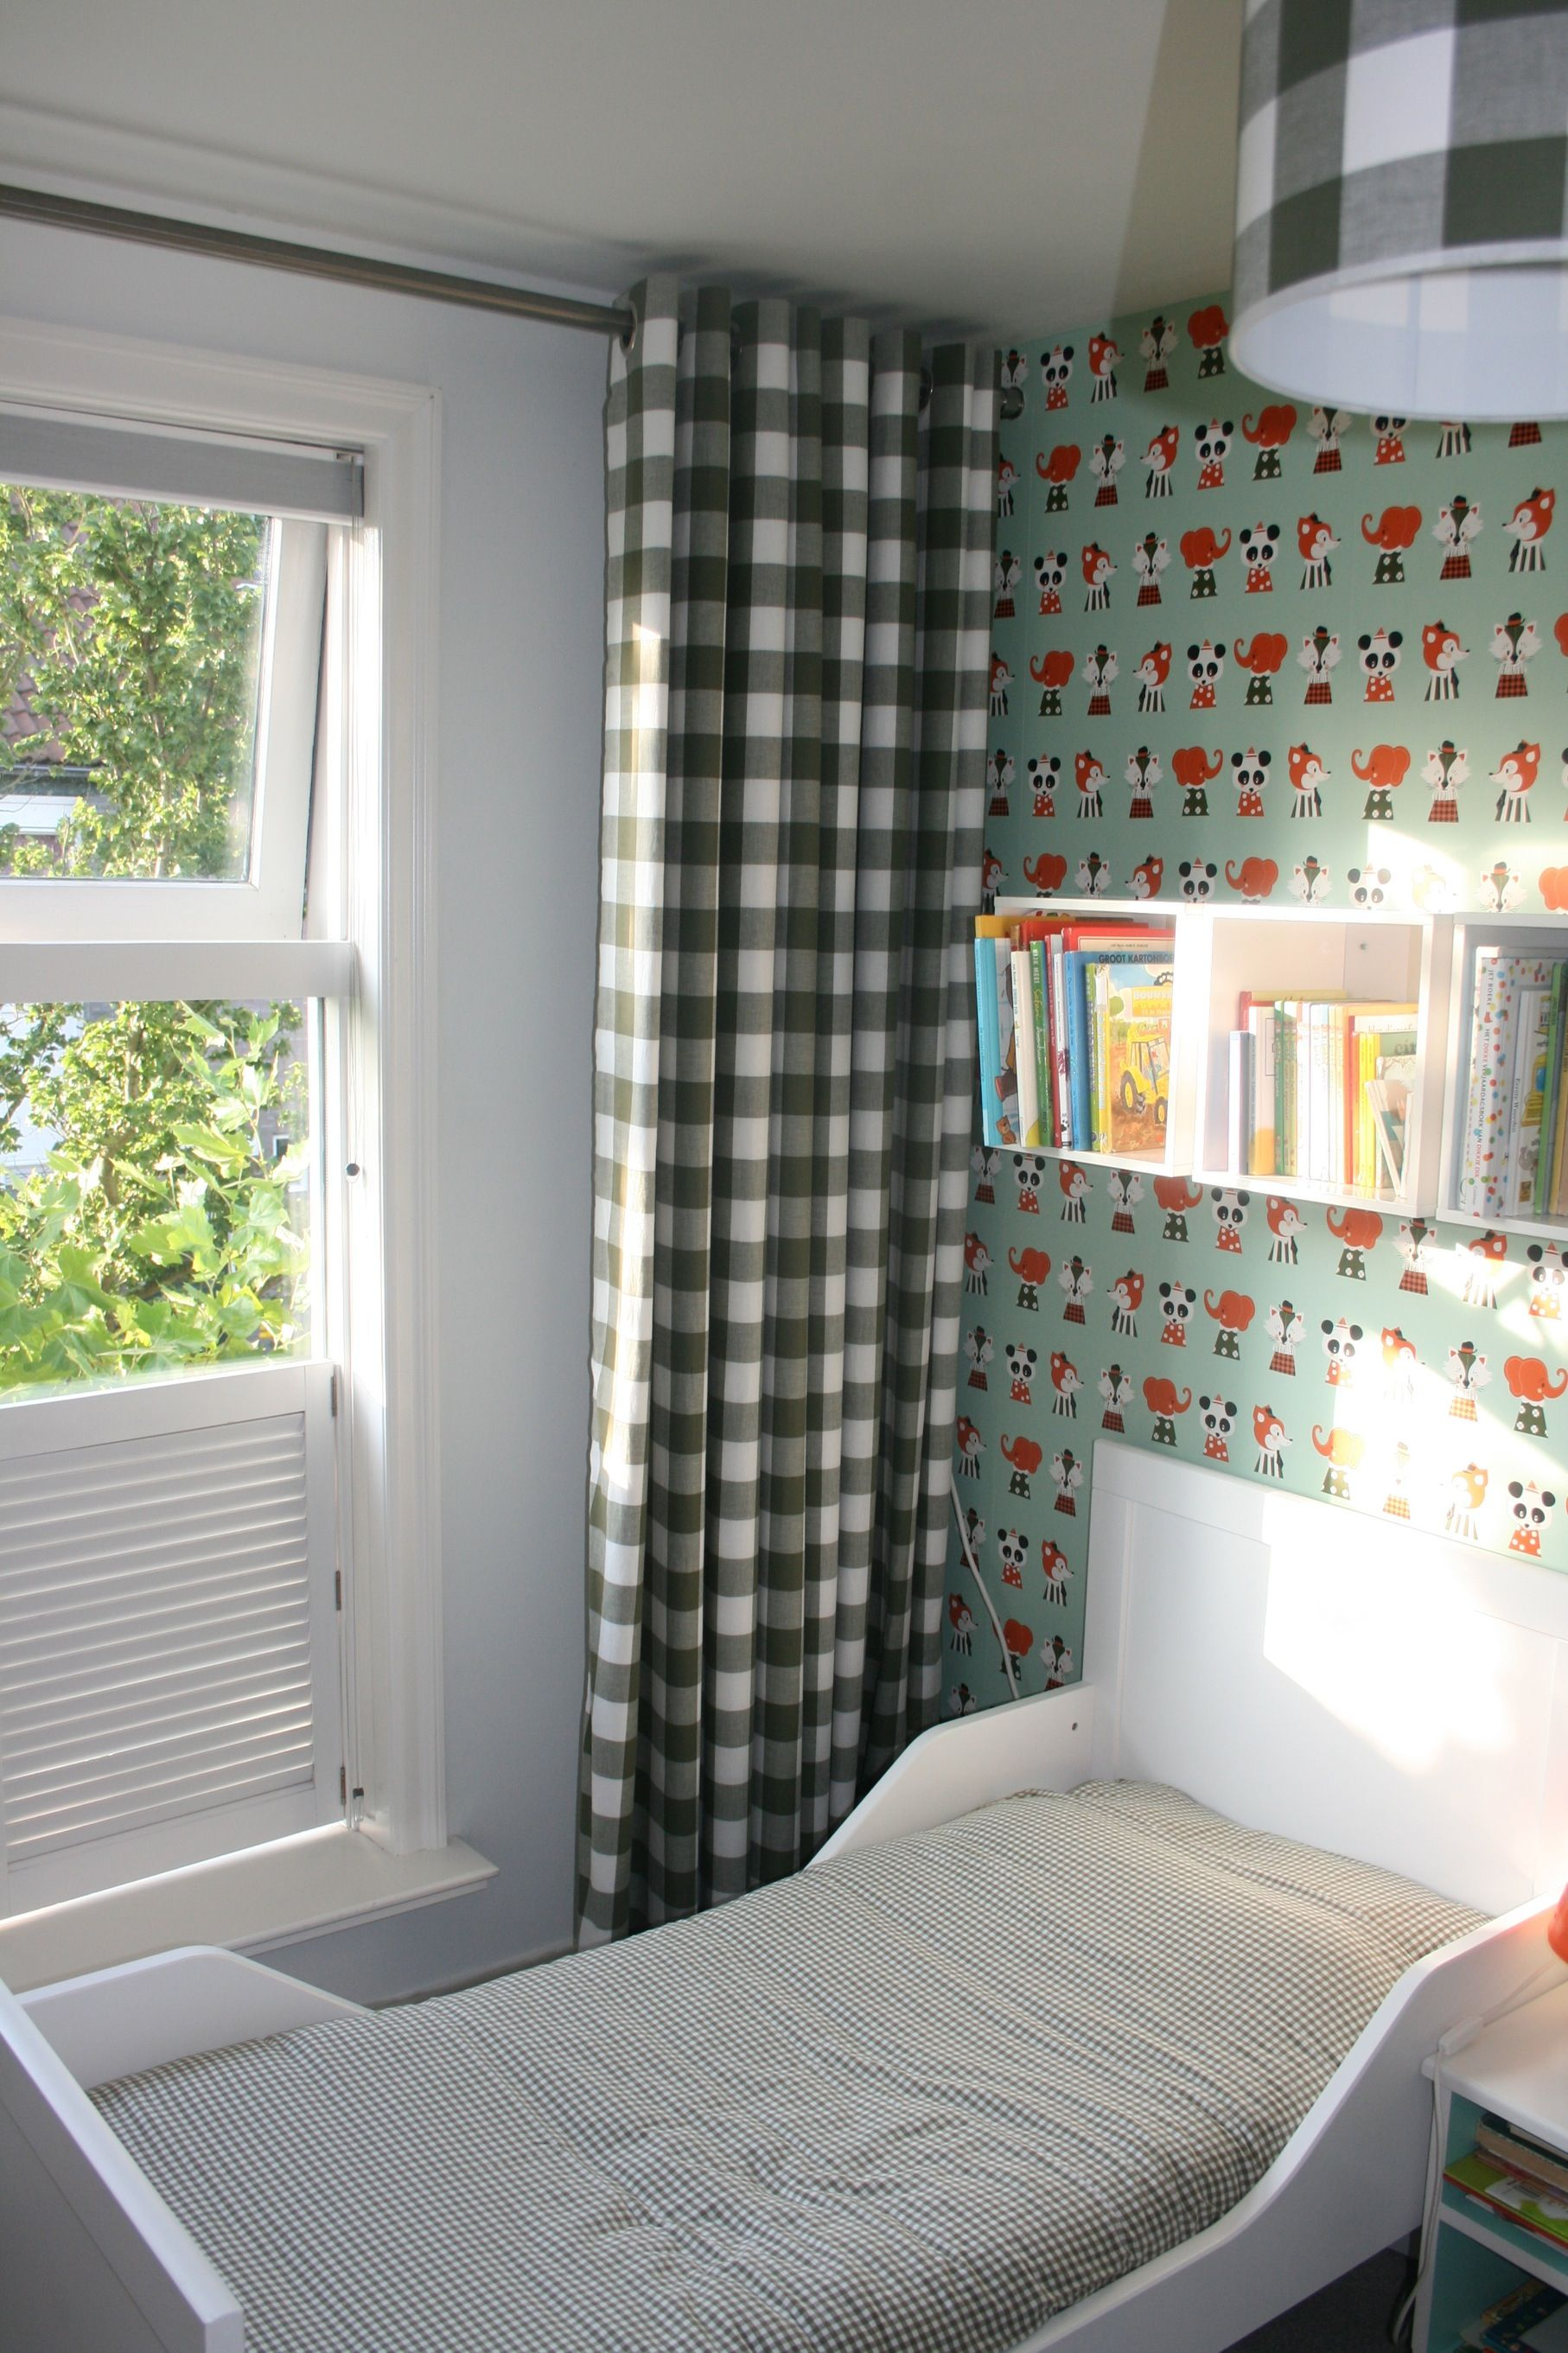 kinderkamer gordijnen curtains boer bontig inspiration